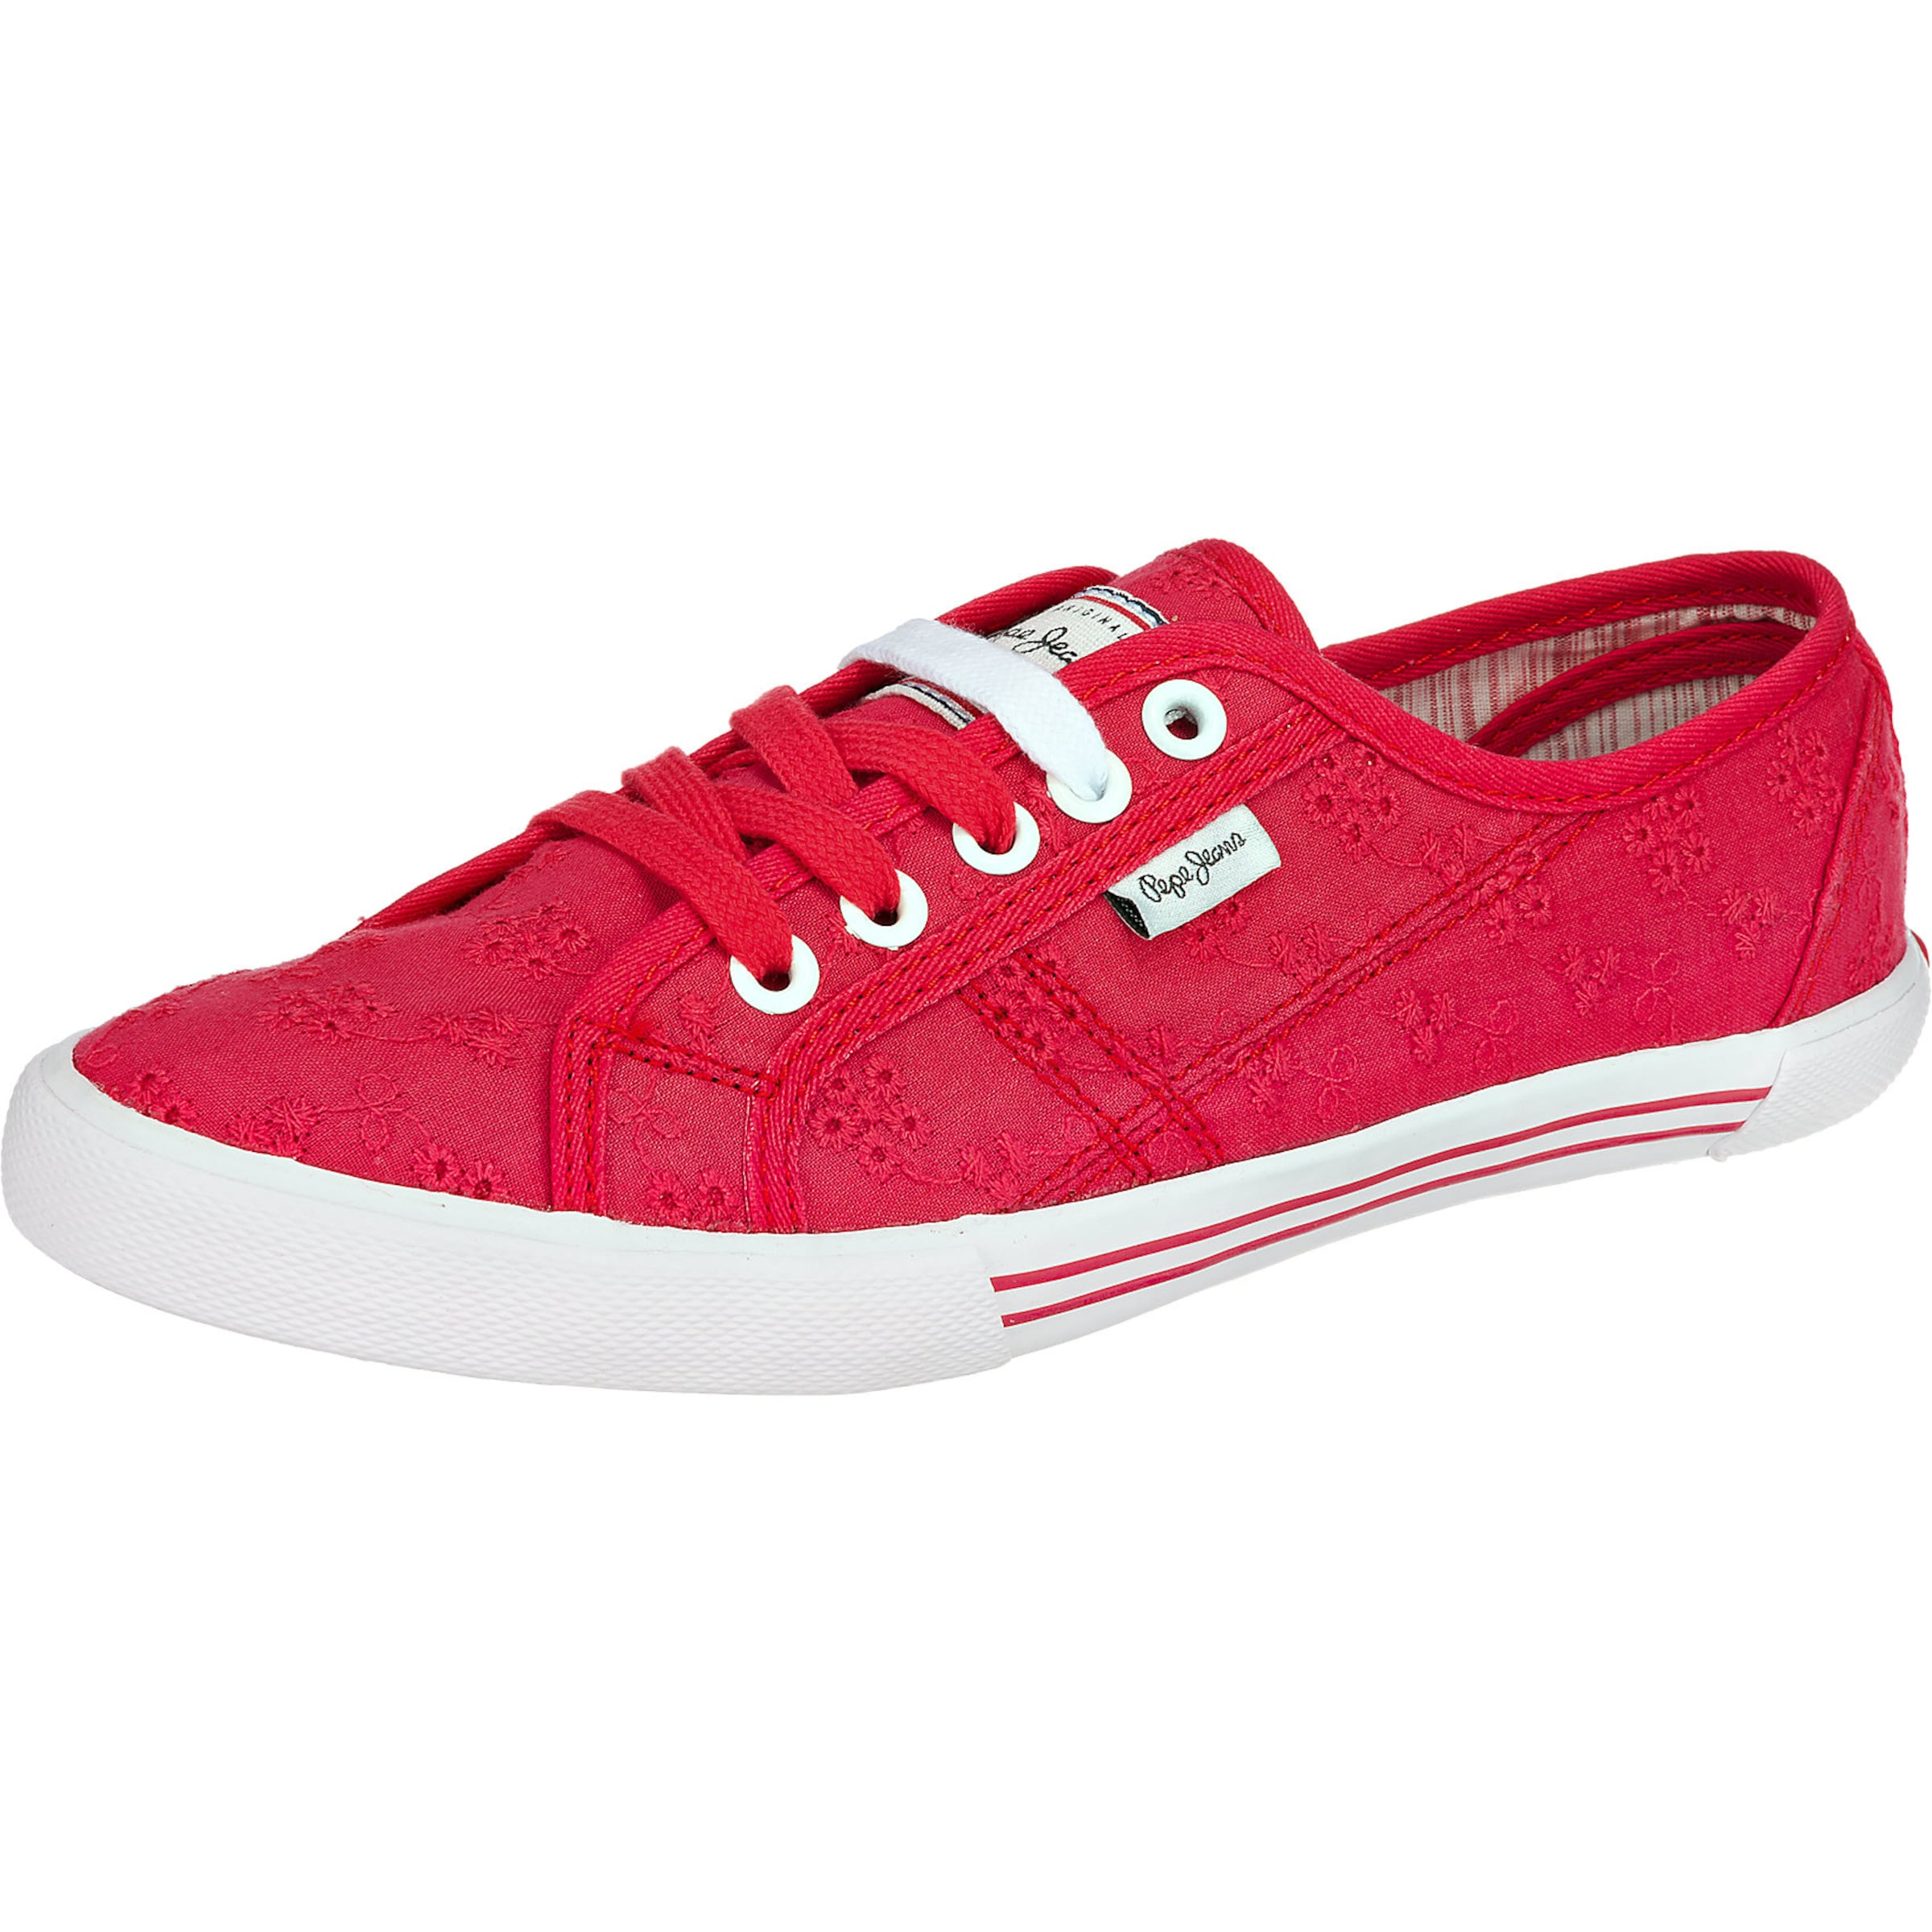 Billig Pepe Jeans Sneaker 'Anglaise' Billig Verkauf Komfortabel QBHrwUSCdA